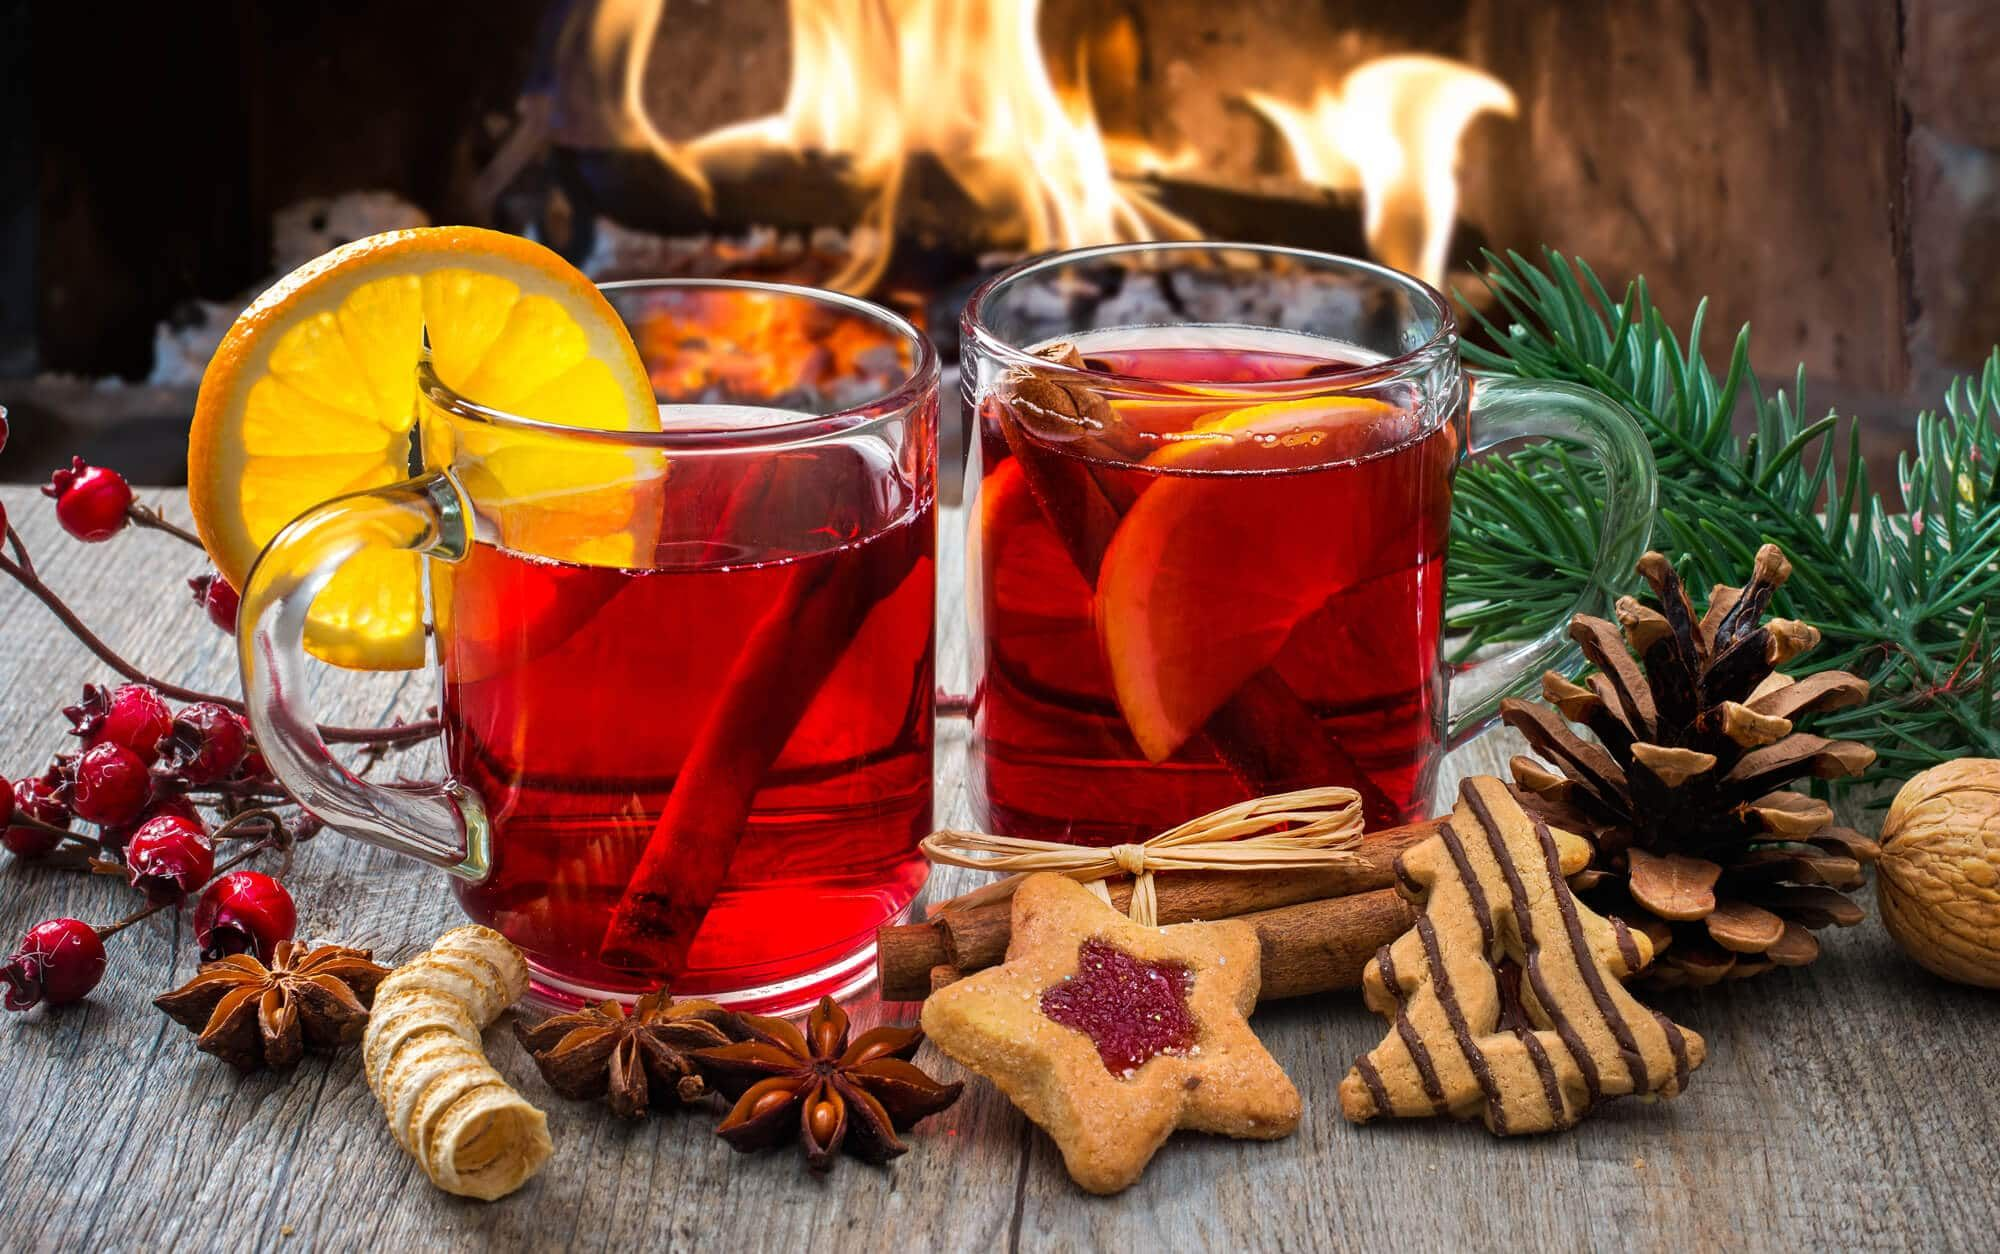 Kinderpunsch German Non Alcoholic Christmas Punch Recipe Non Alcoholic Christmas Punch Christmas Punch Recipes Non Alcoholic